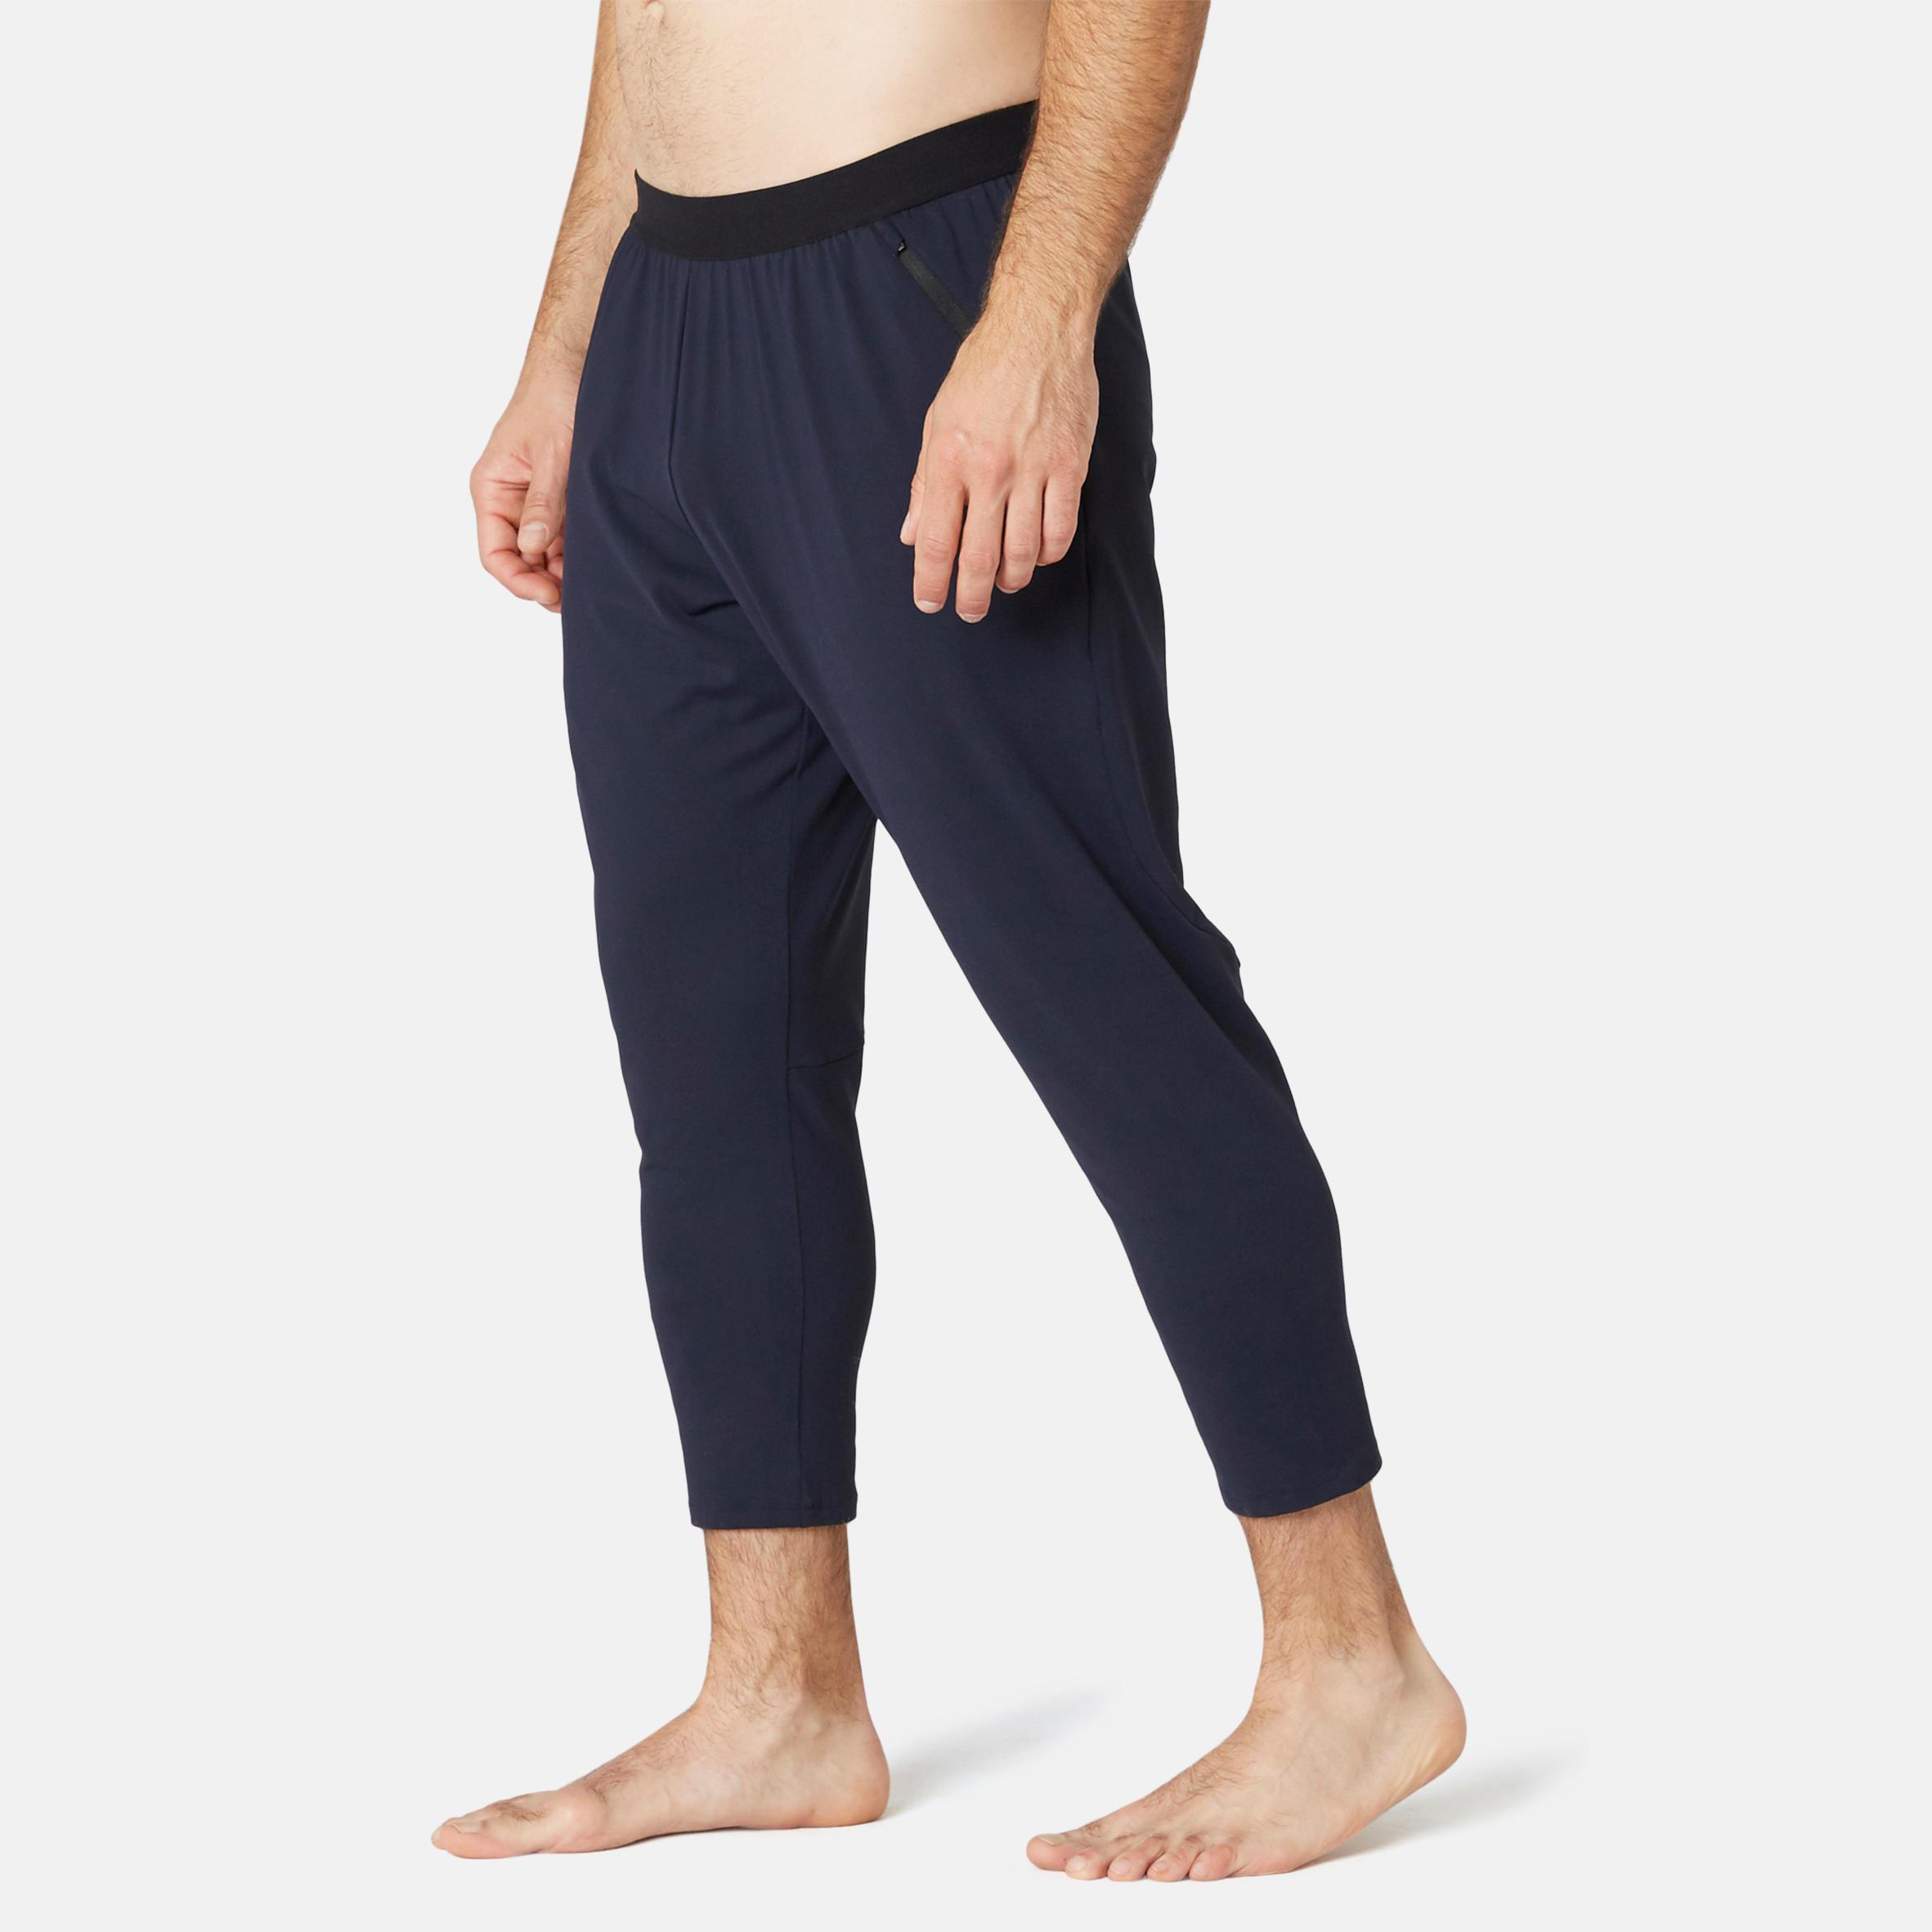 Pantalon slim 560 7/8 Bărbați